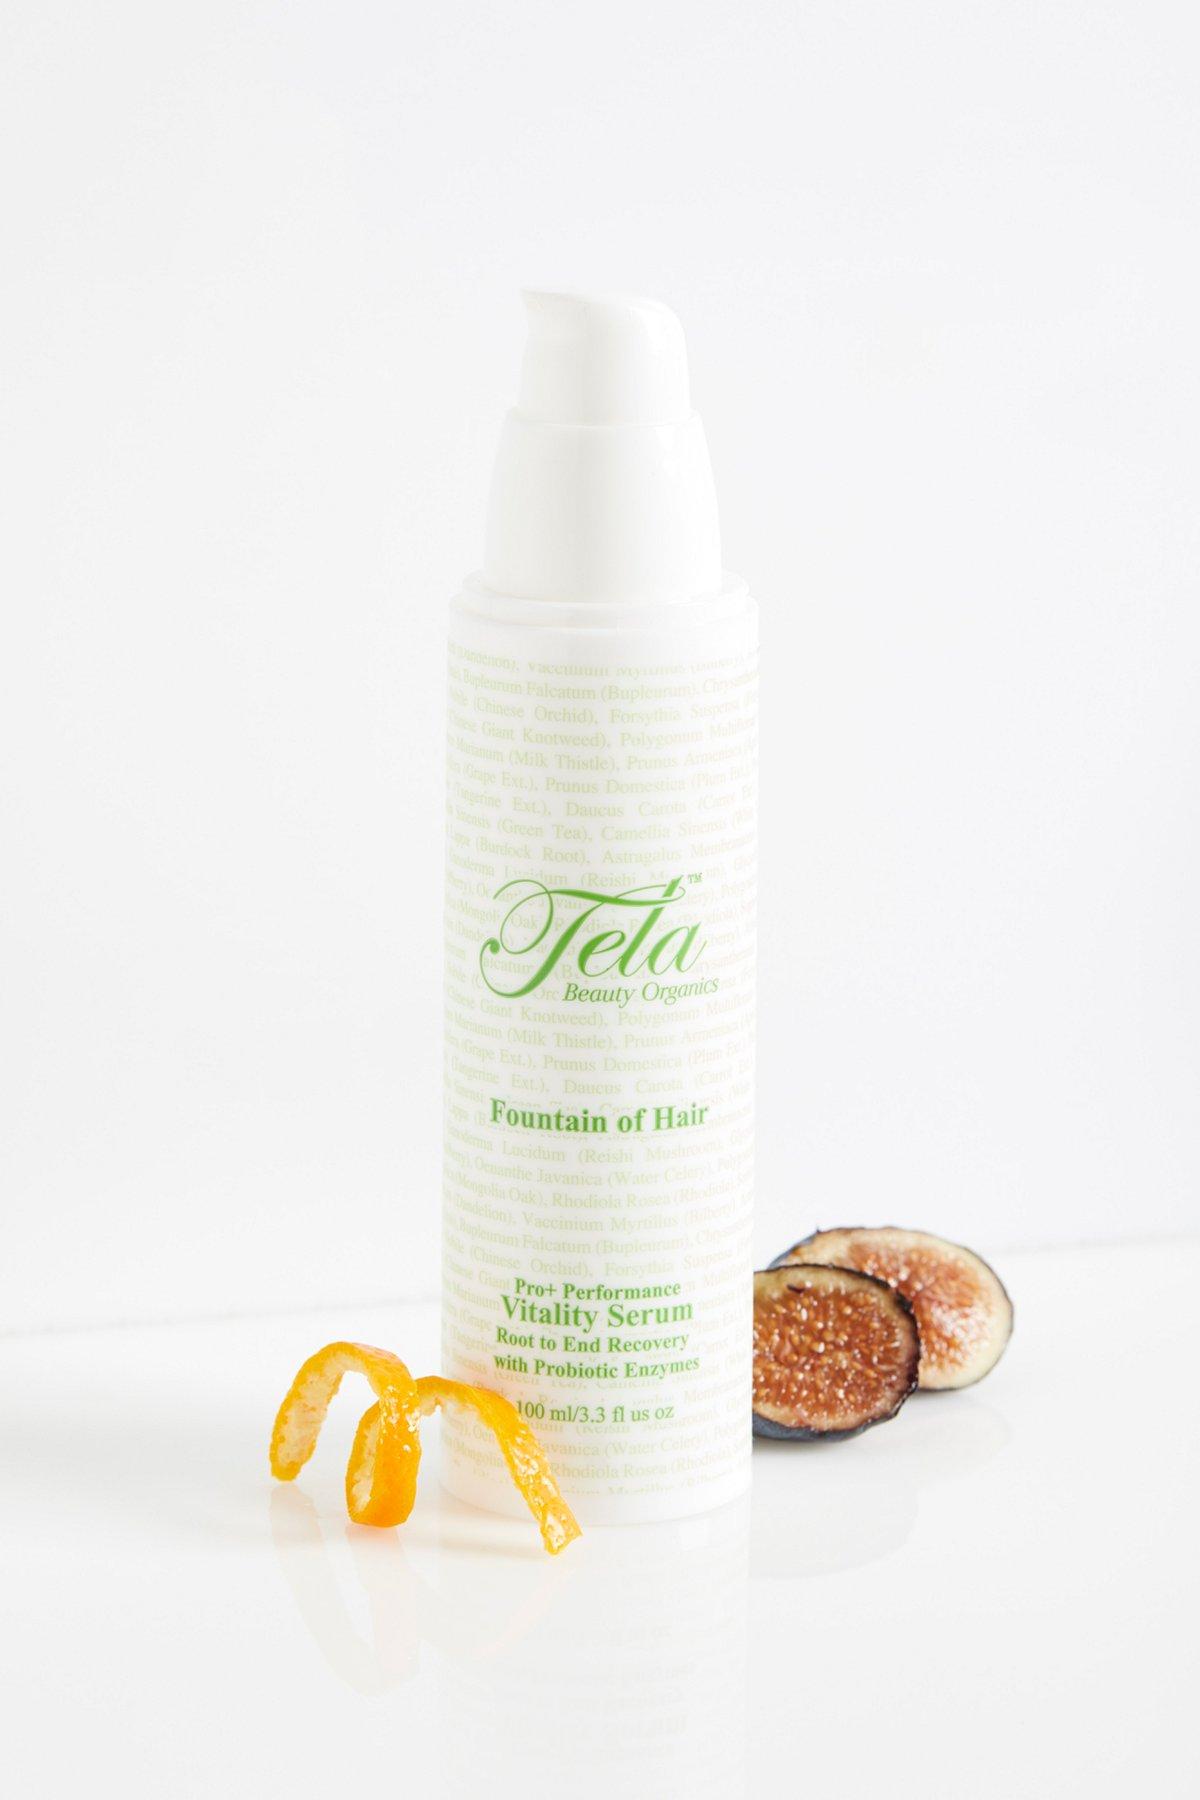 Fountain Of Hair Vitality Serum